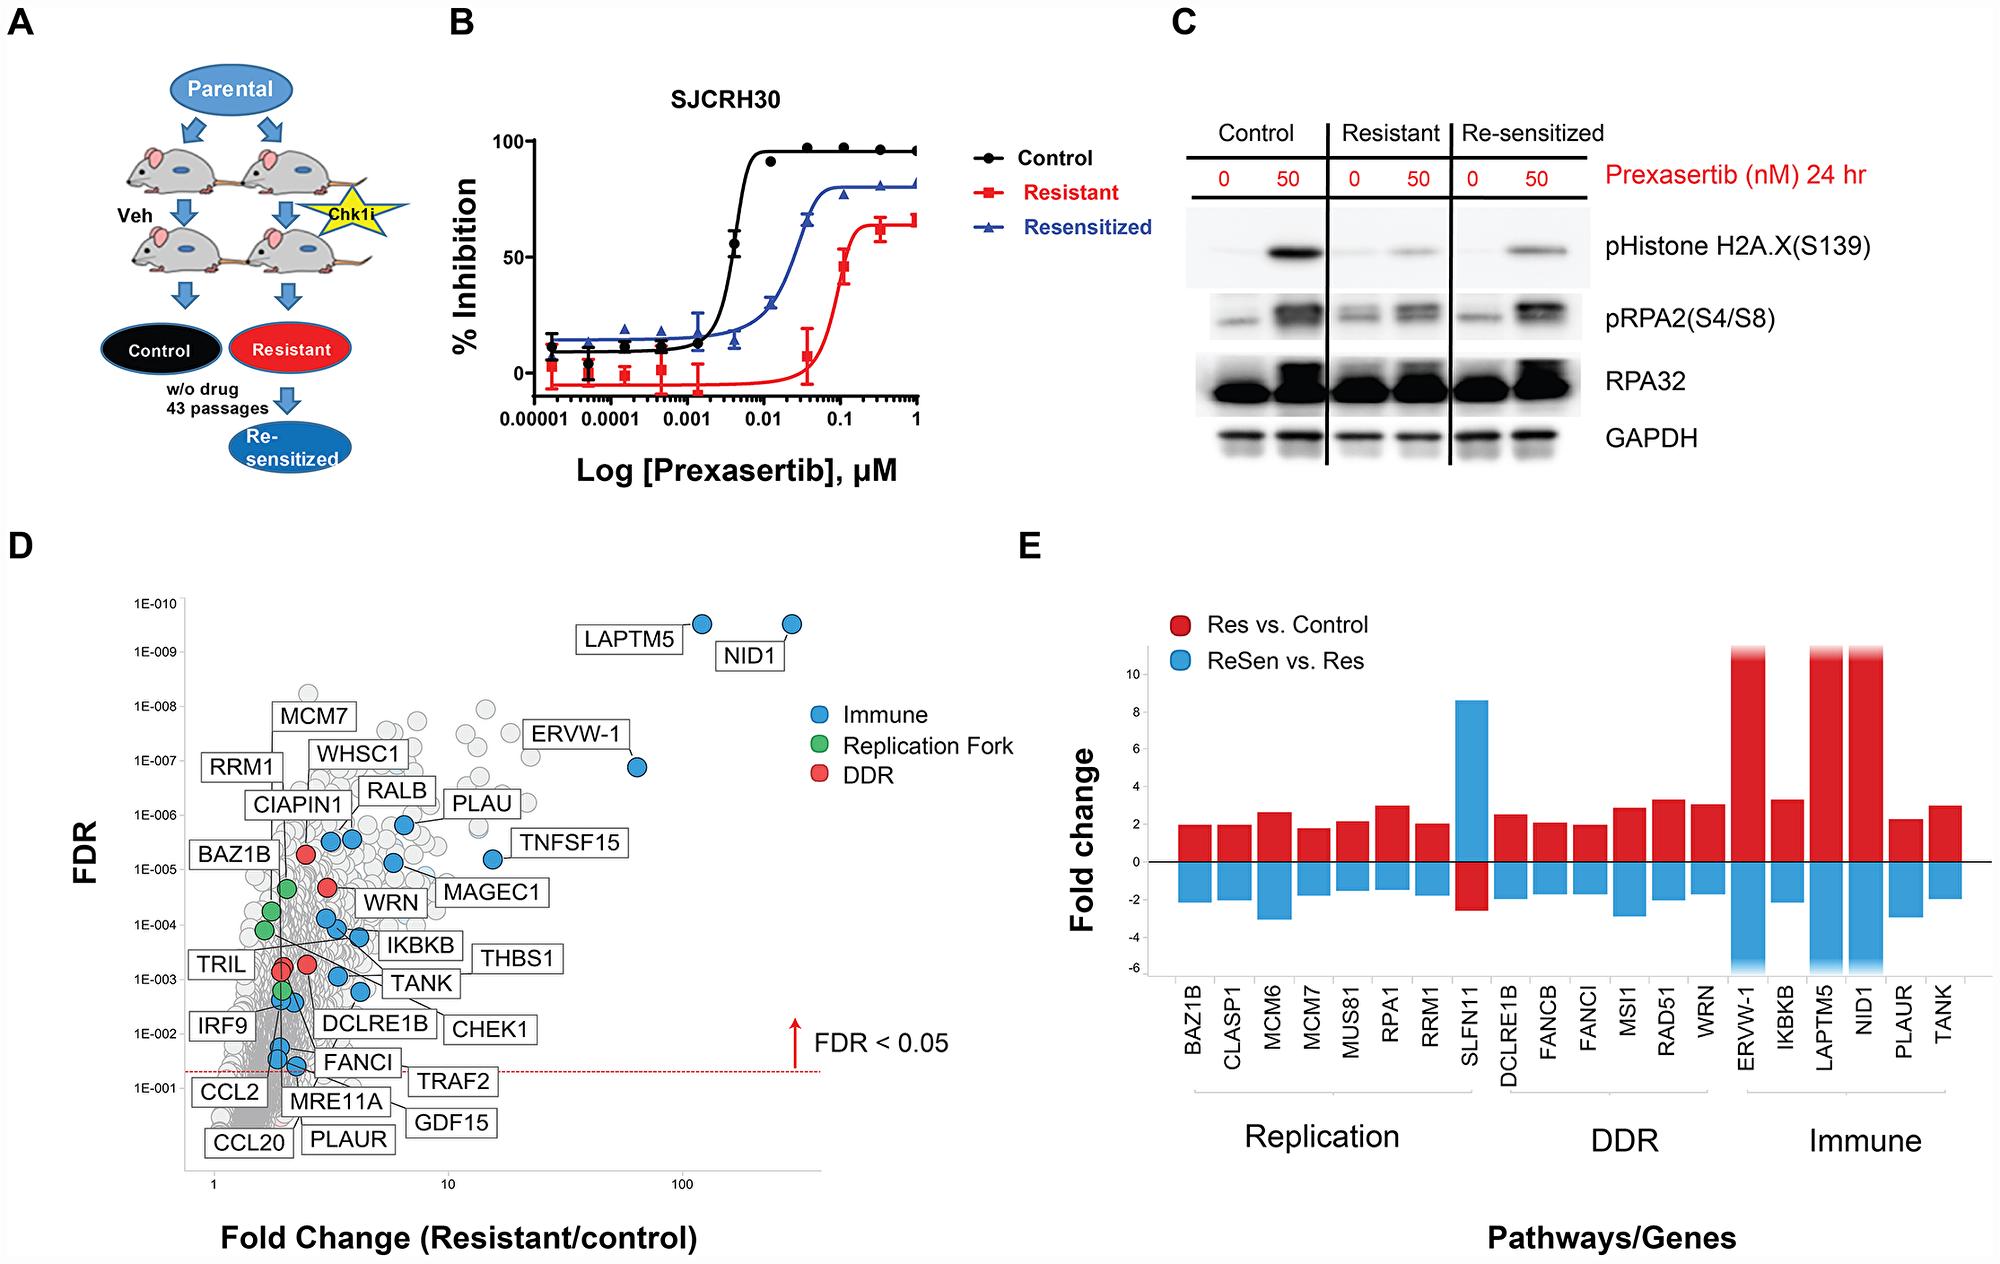 In vivo establishment and genomic characterization of acquired resistance to prexasertib in the aRMS SJC-Rh30 xenograft model.